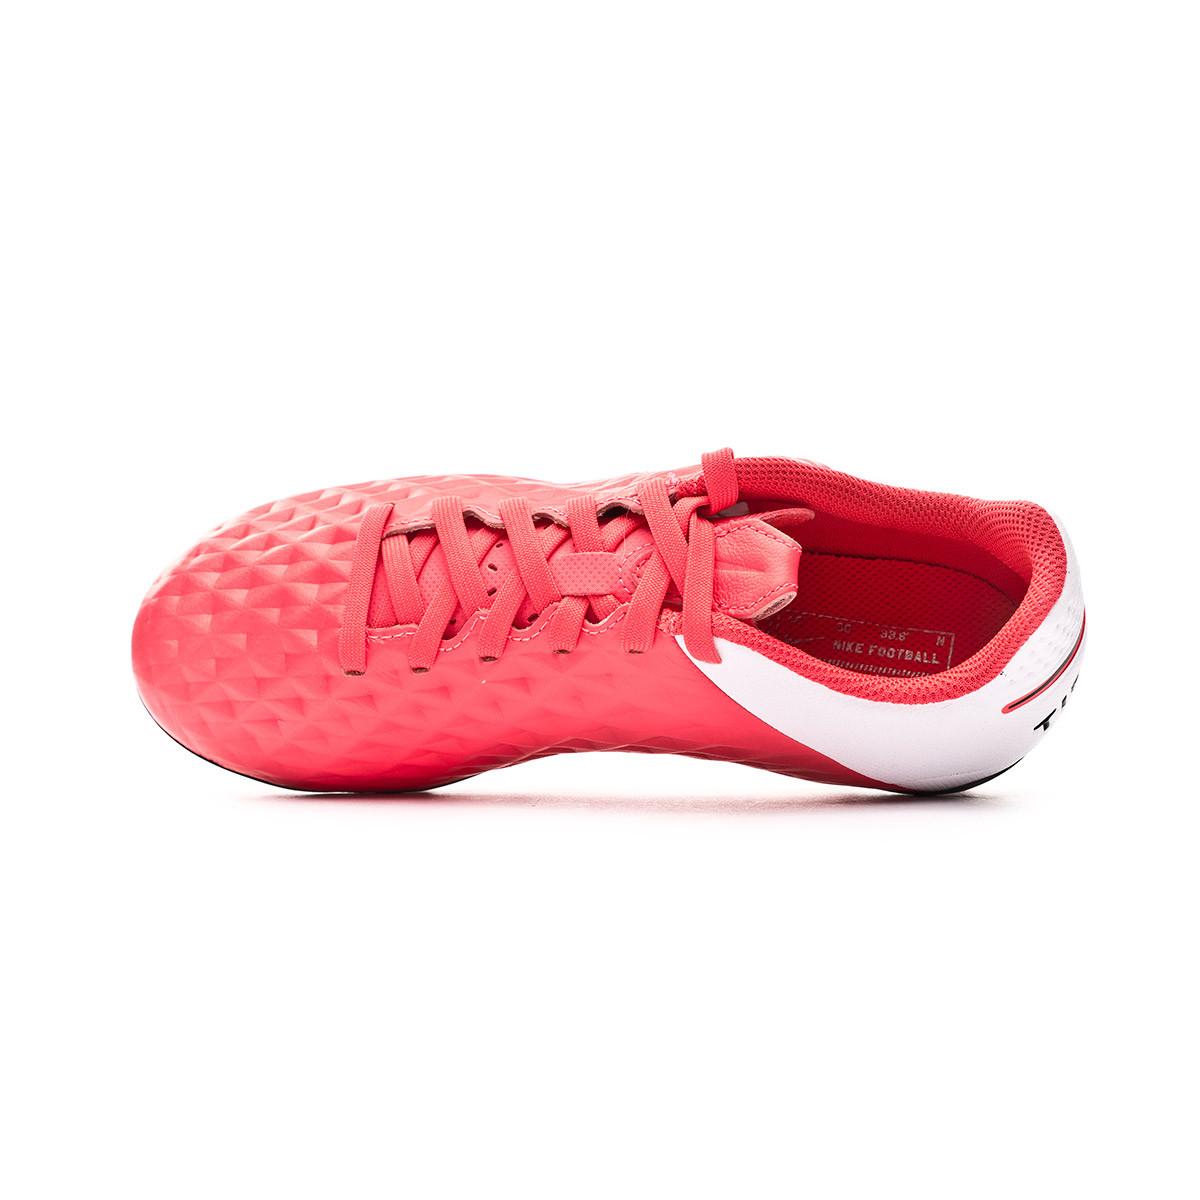 Academy Chaussure de Nike Enfant foot FGMG Legend VIII UMSzGqVp